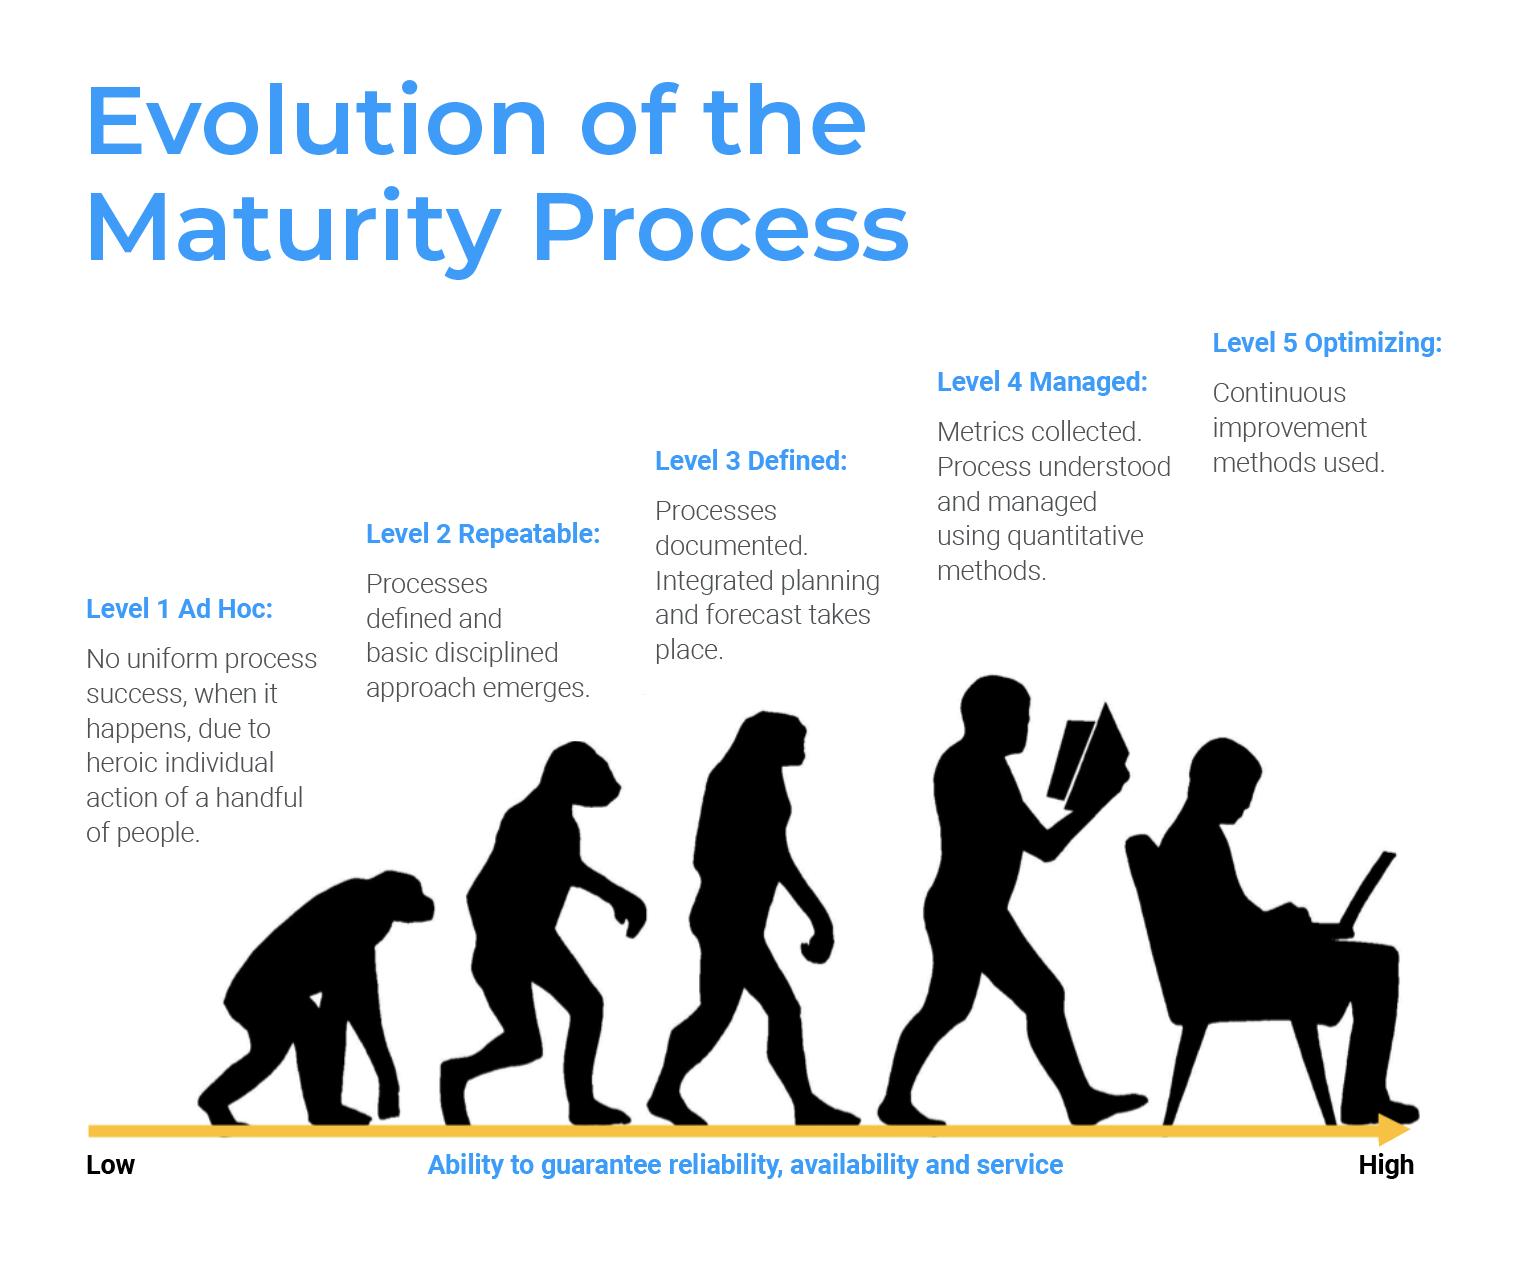 Enterprise Risk Management - The Blurring of the Lines - Figure 1